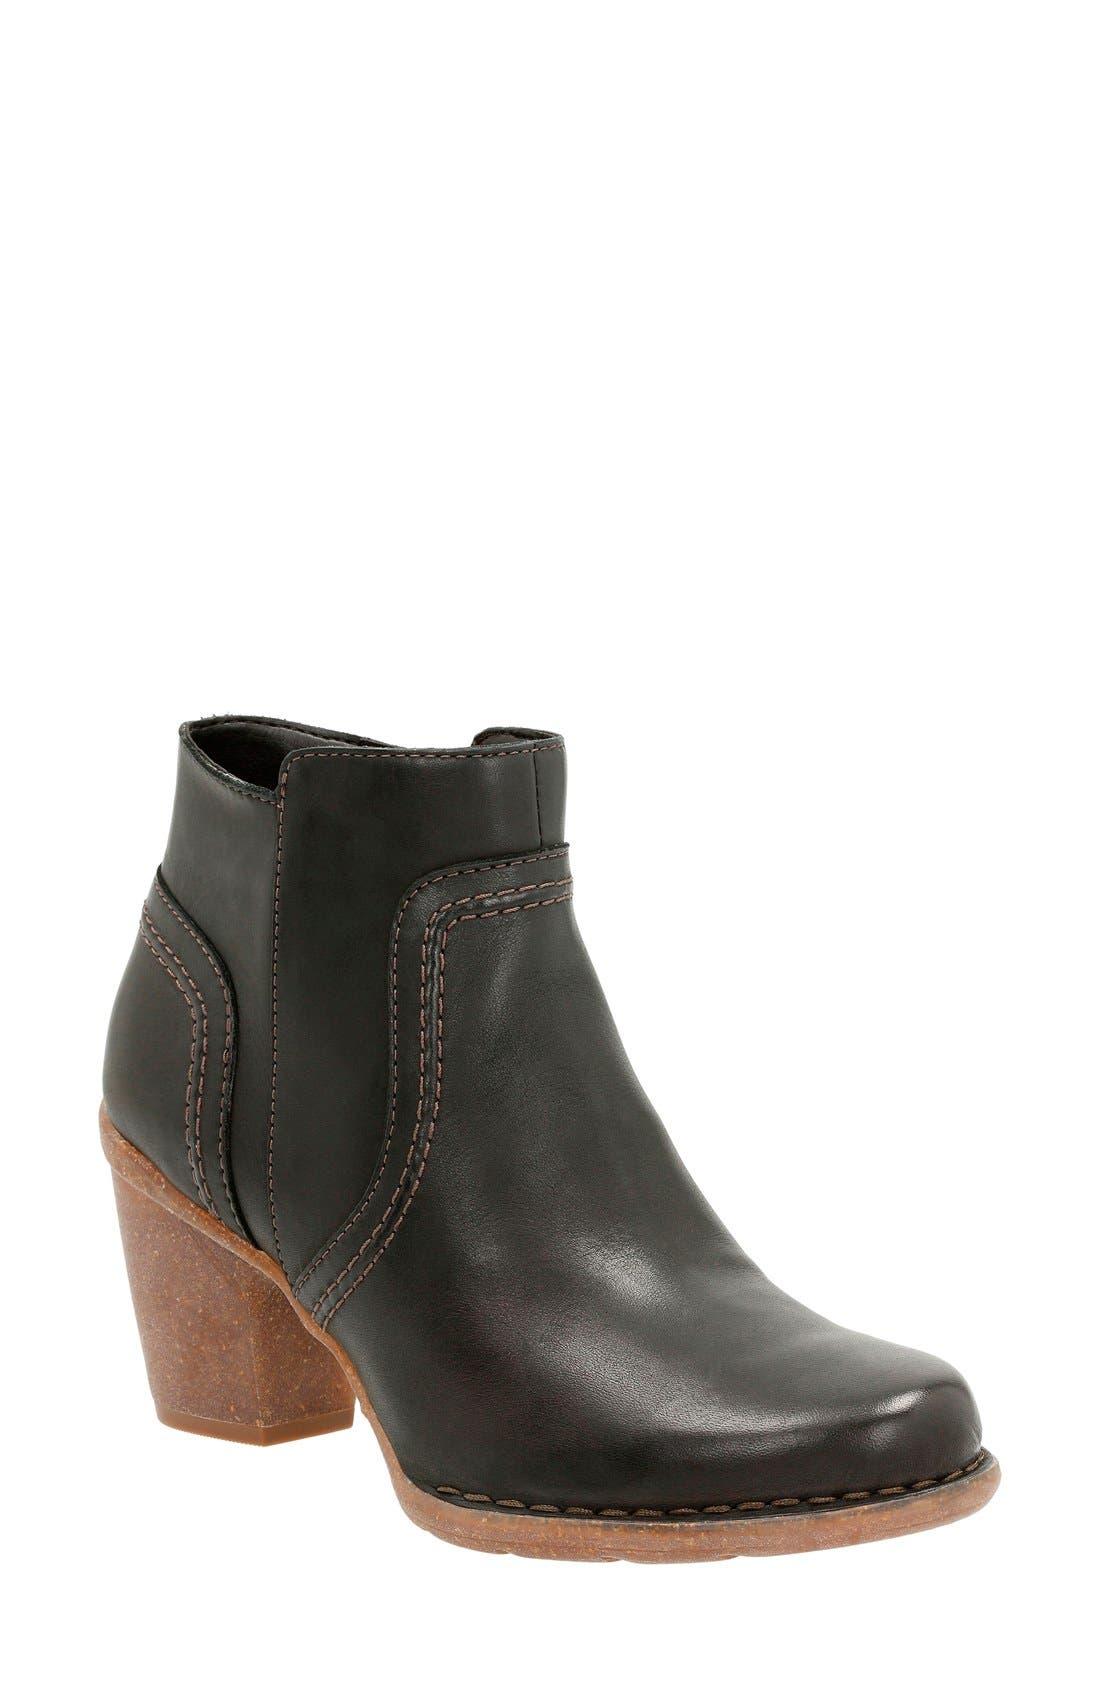 'Carleta Paris' Ankle Boot,                             Main thumbnail 1, color,                             Black Leather